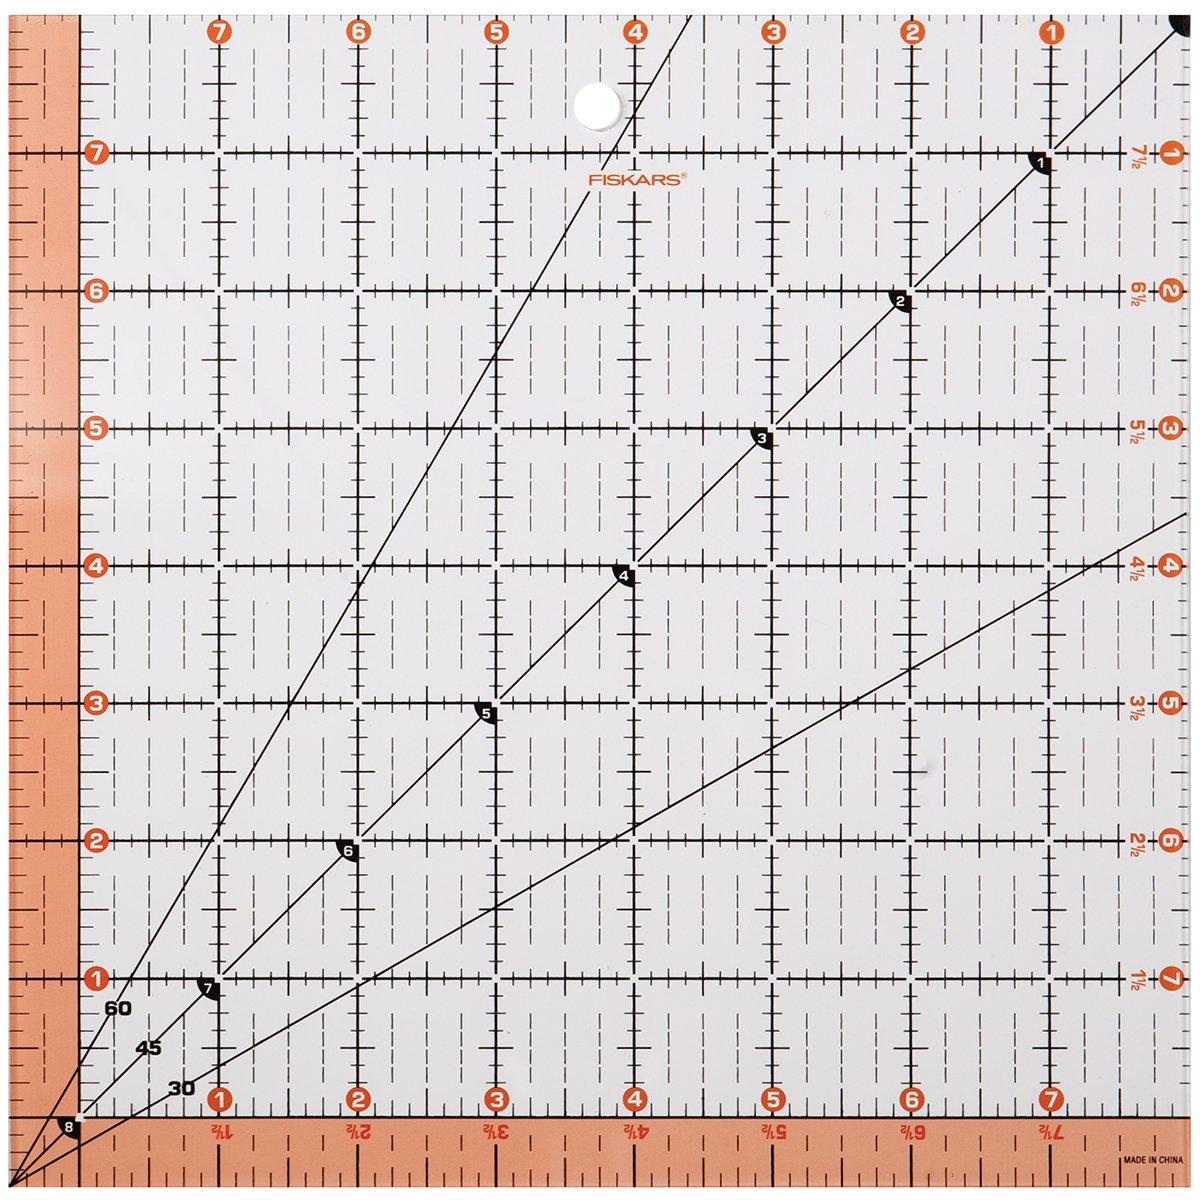 Fiskars 8.5x8.5 Square Acrylic Ruler (187200-1001) Cell Distributors 187200-1000